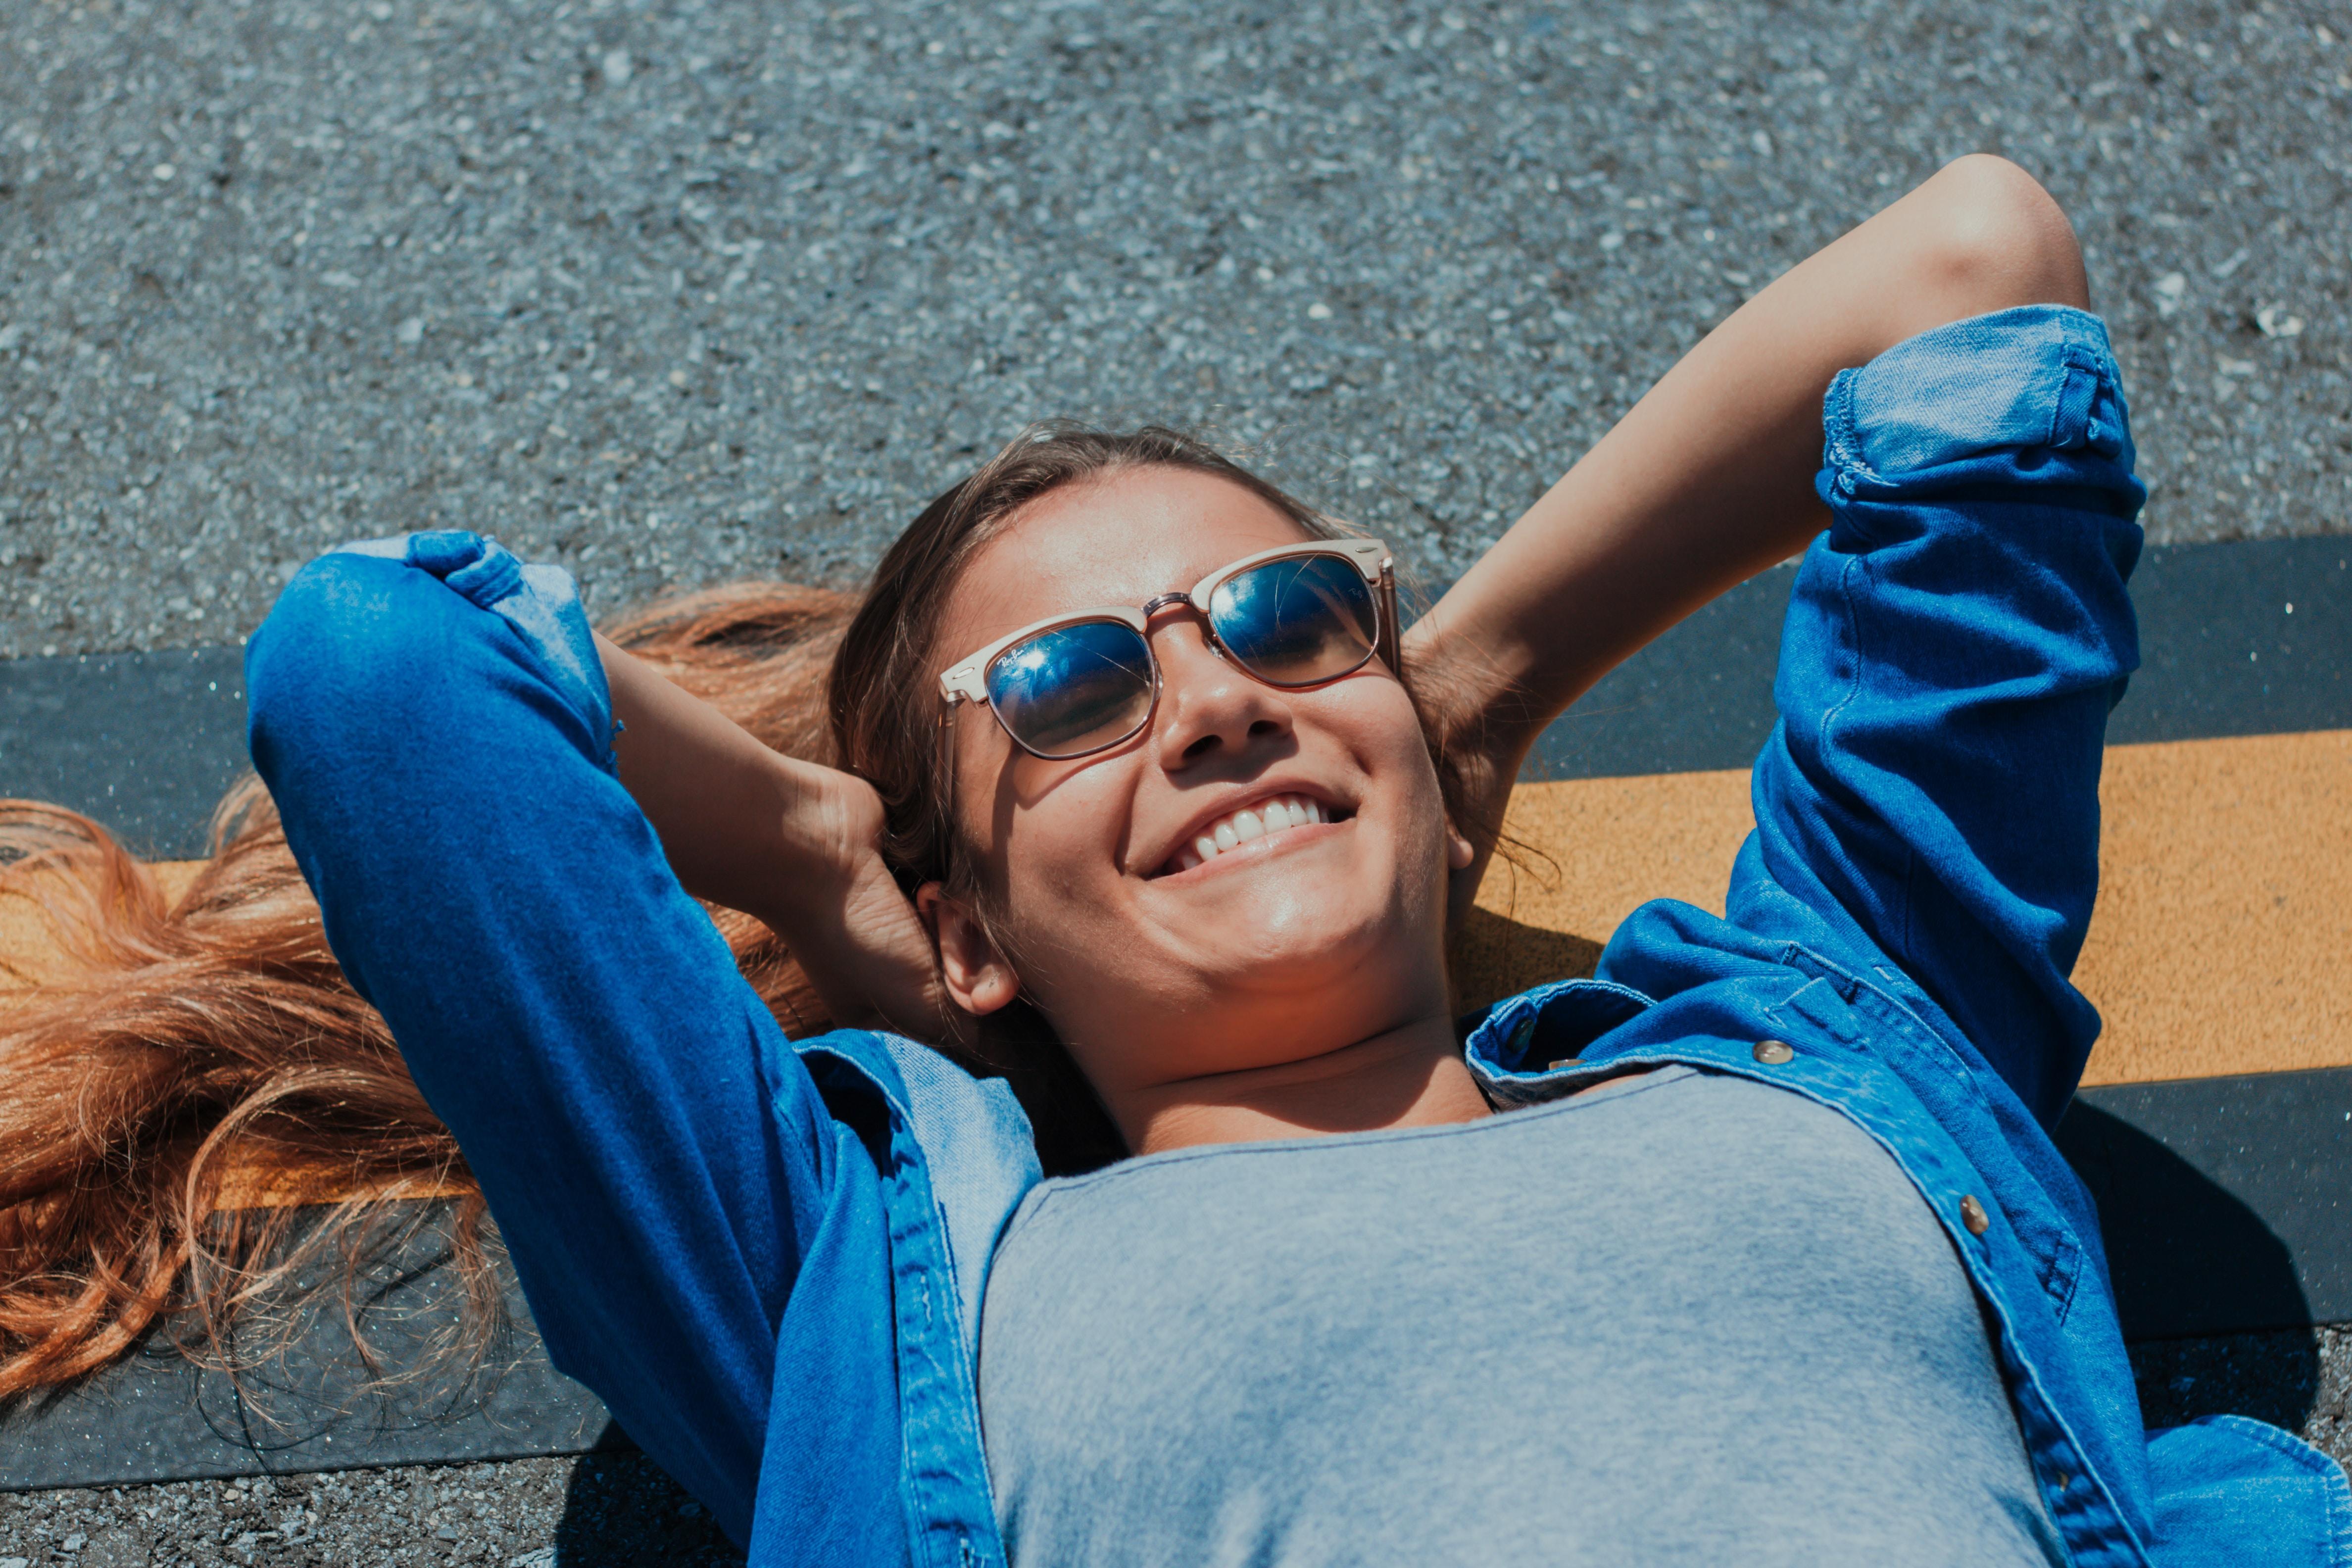 smiling woman lying on concrete pavement